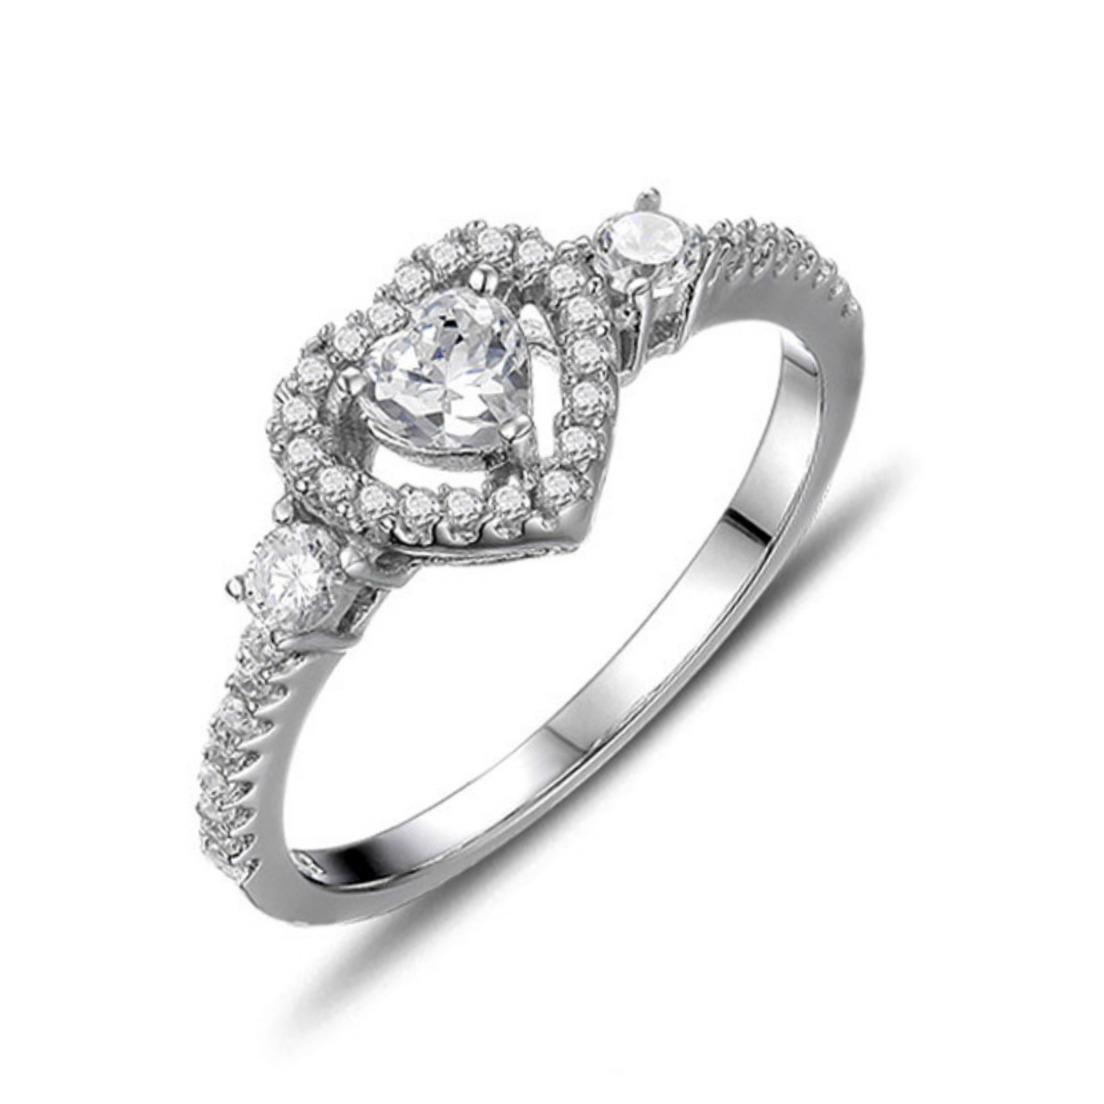 Minimal Heart Shaped Diamond Engagement Ring ER 006 | Womandilax™ | Shop  Womenu0027s Jewelry U0026 Accessories